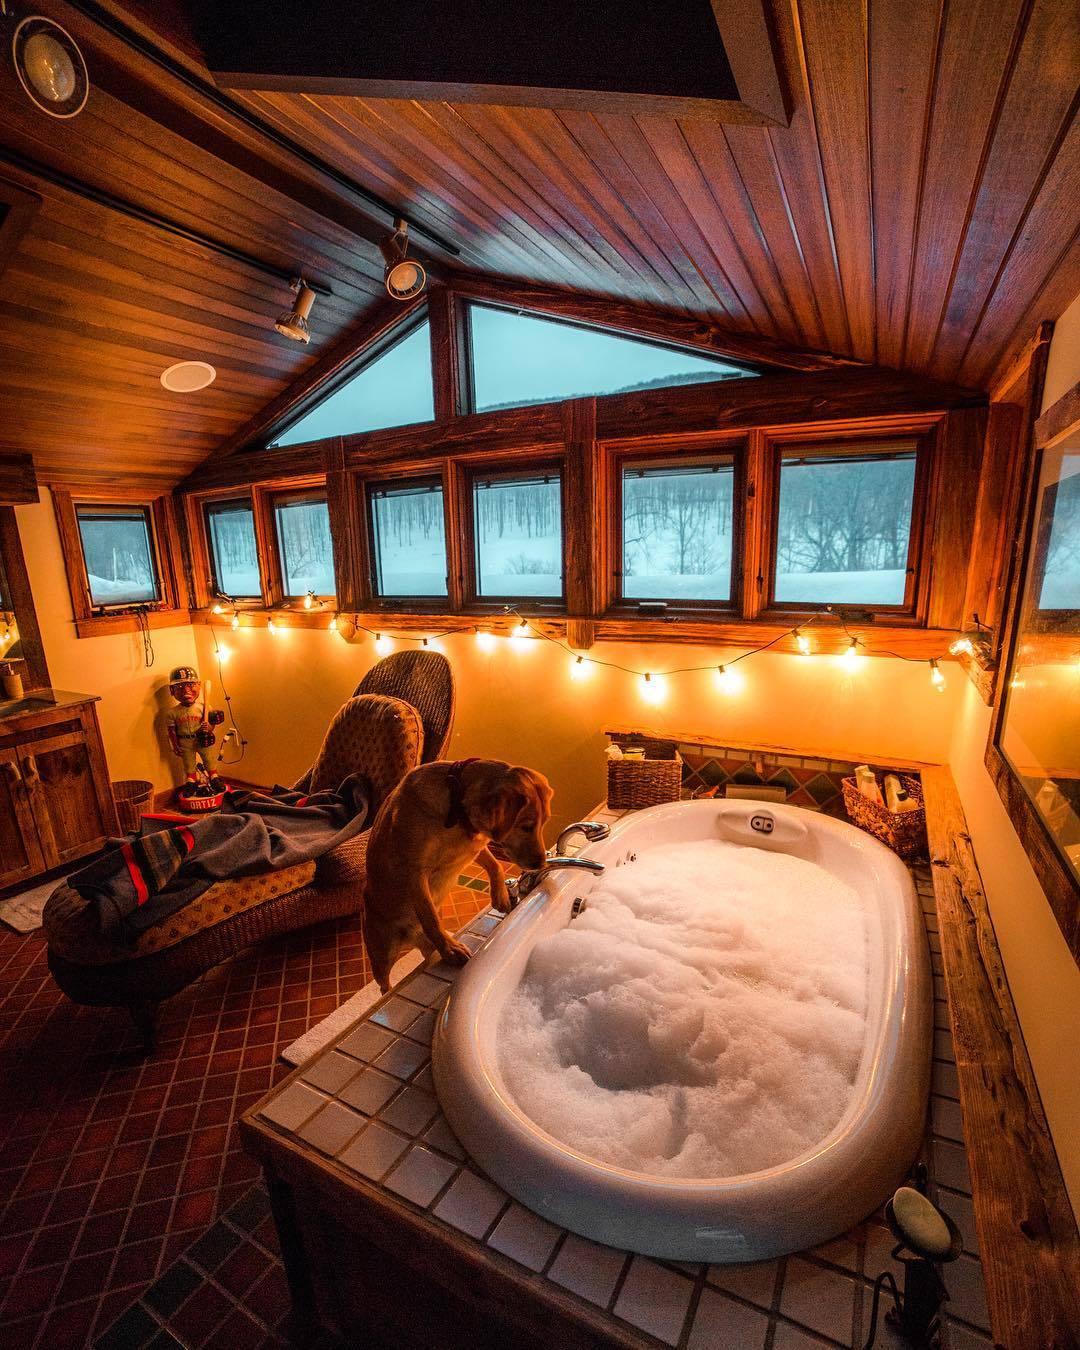 doggo wants a bath